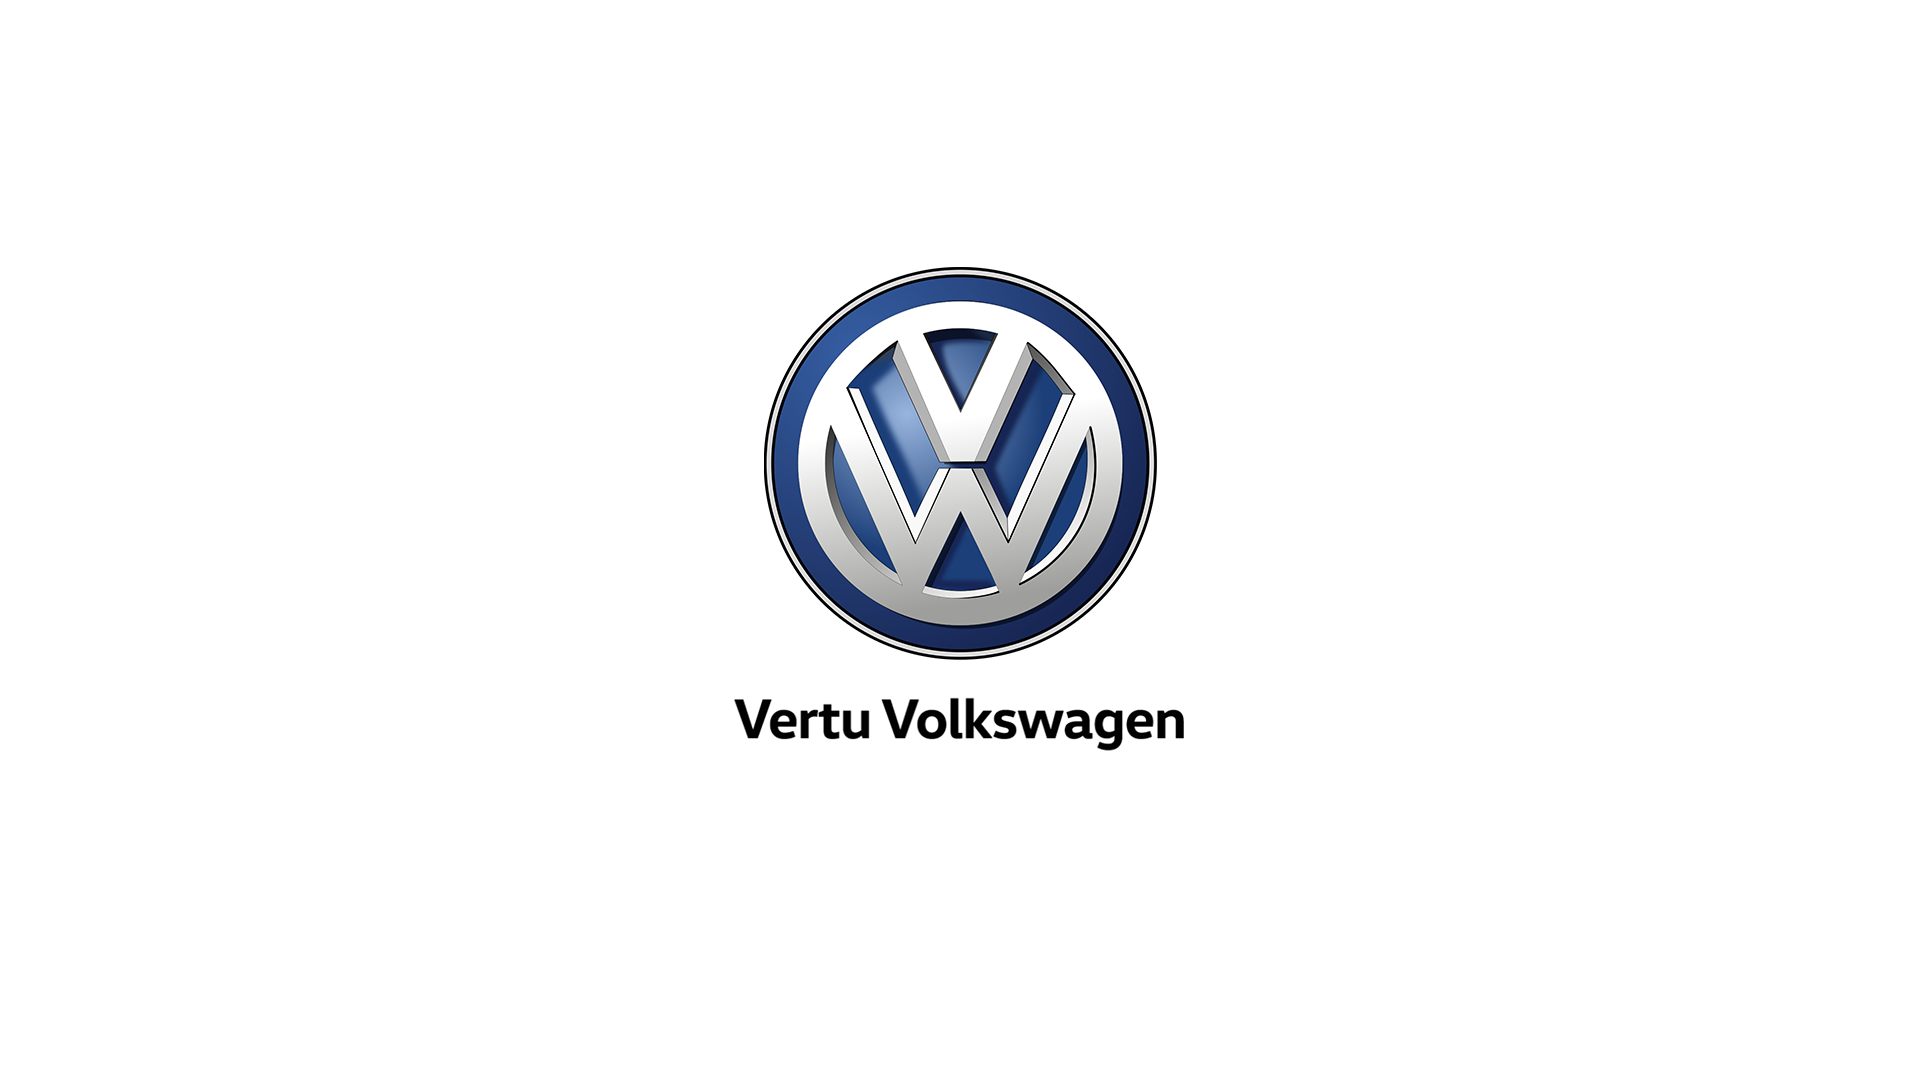 Vertu Volkswagen Nottingham South